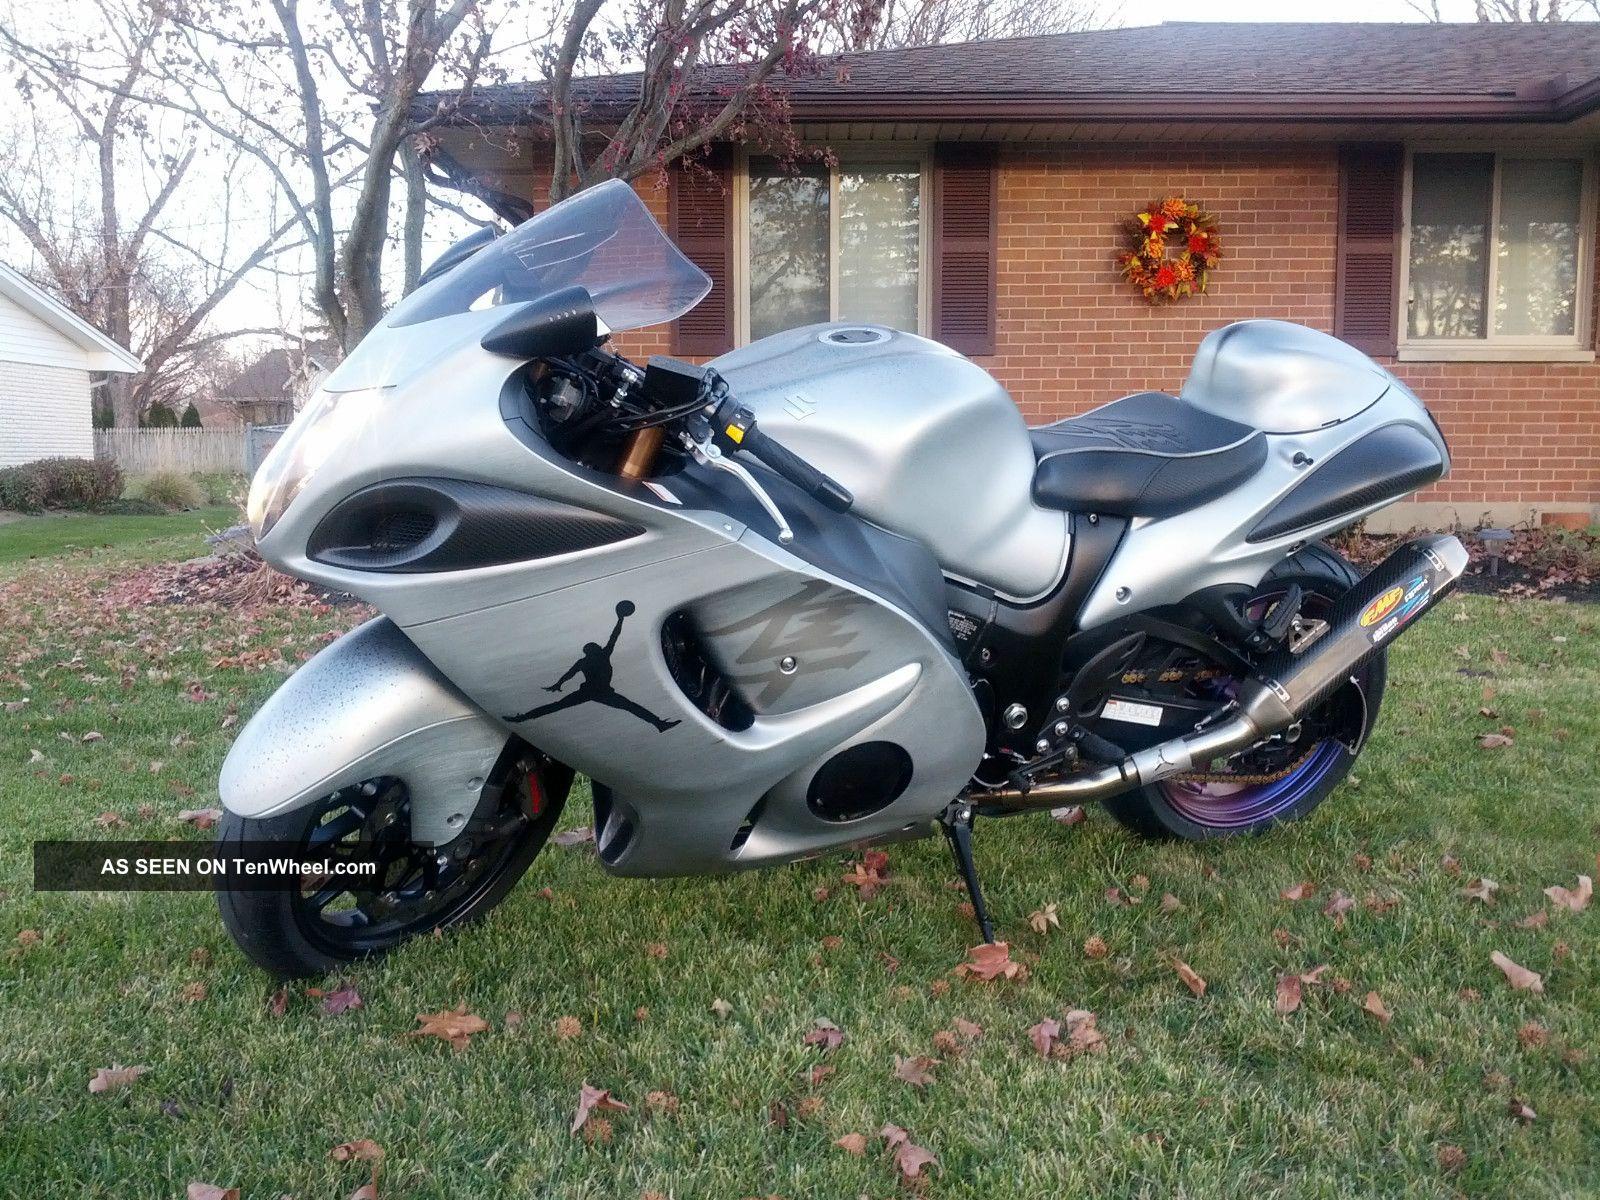 Custom 2011 Suzuki Hayabusa Motorcycle By Michael Jordan